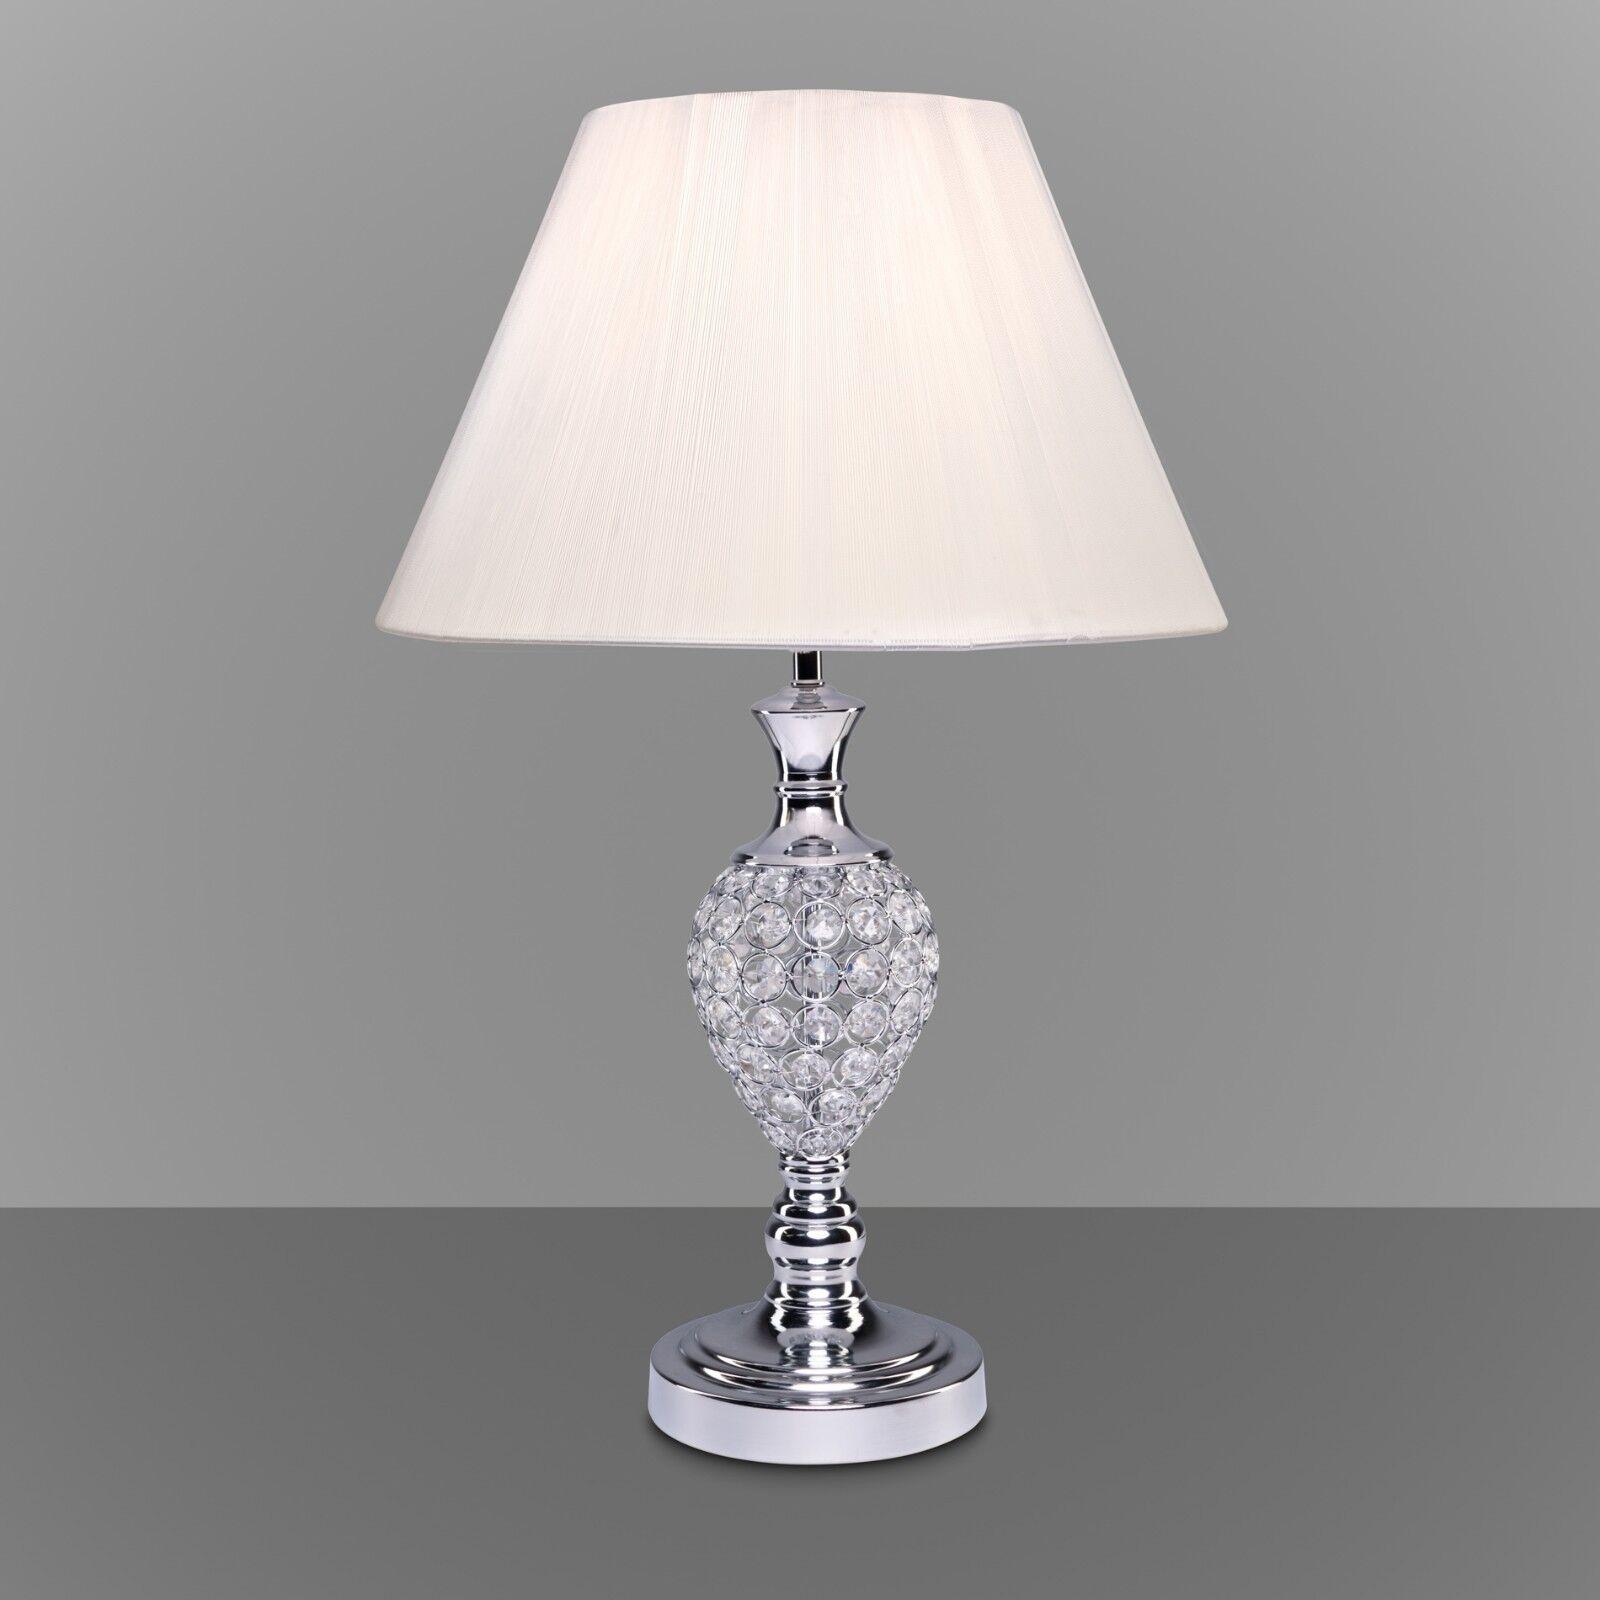 Hannah Chrome Crystal Table Lamp Ivory Shade Modern Bedside Bright 5060377986944 Ebay